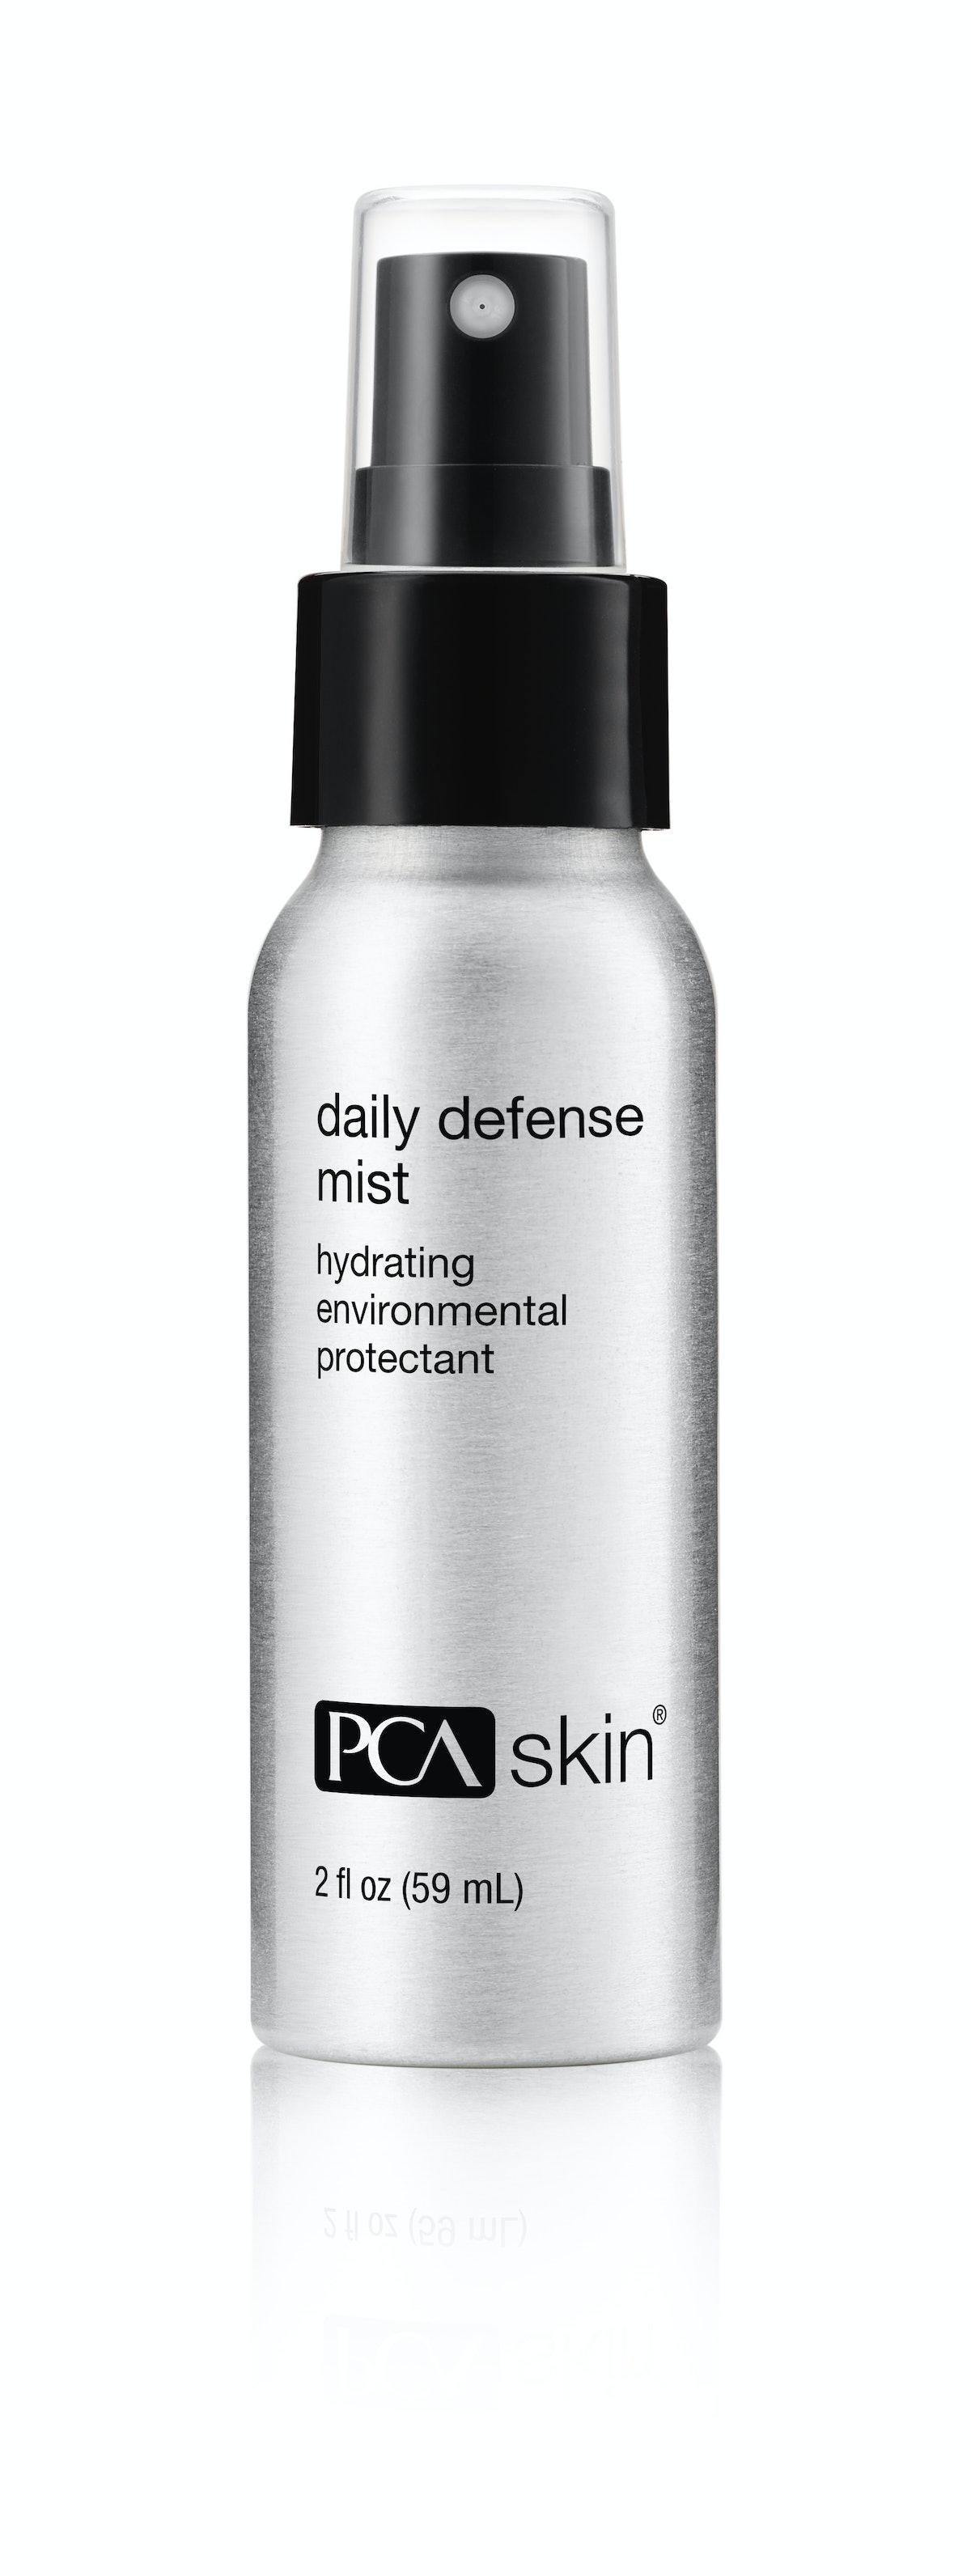 Daily Defense Mist